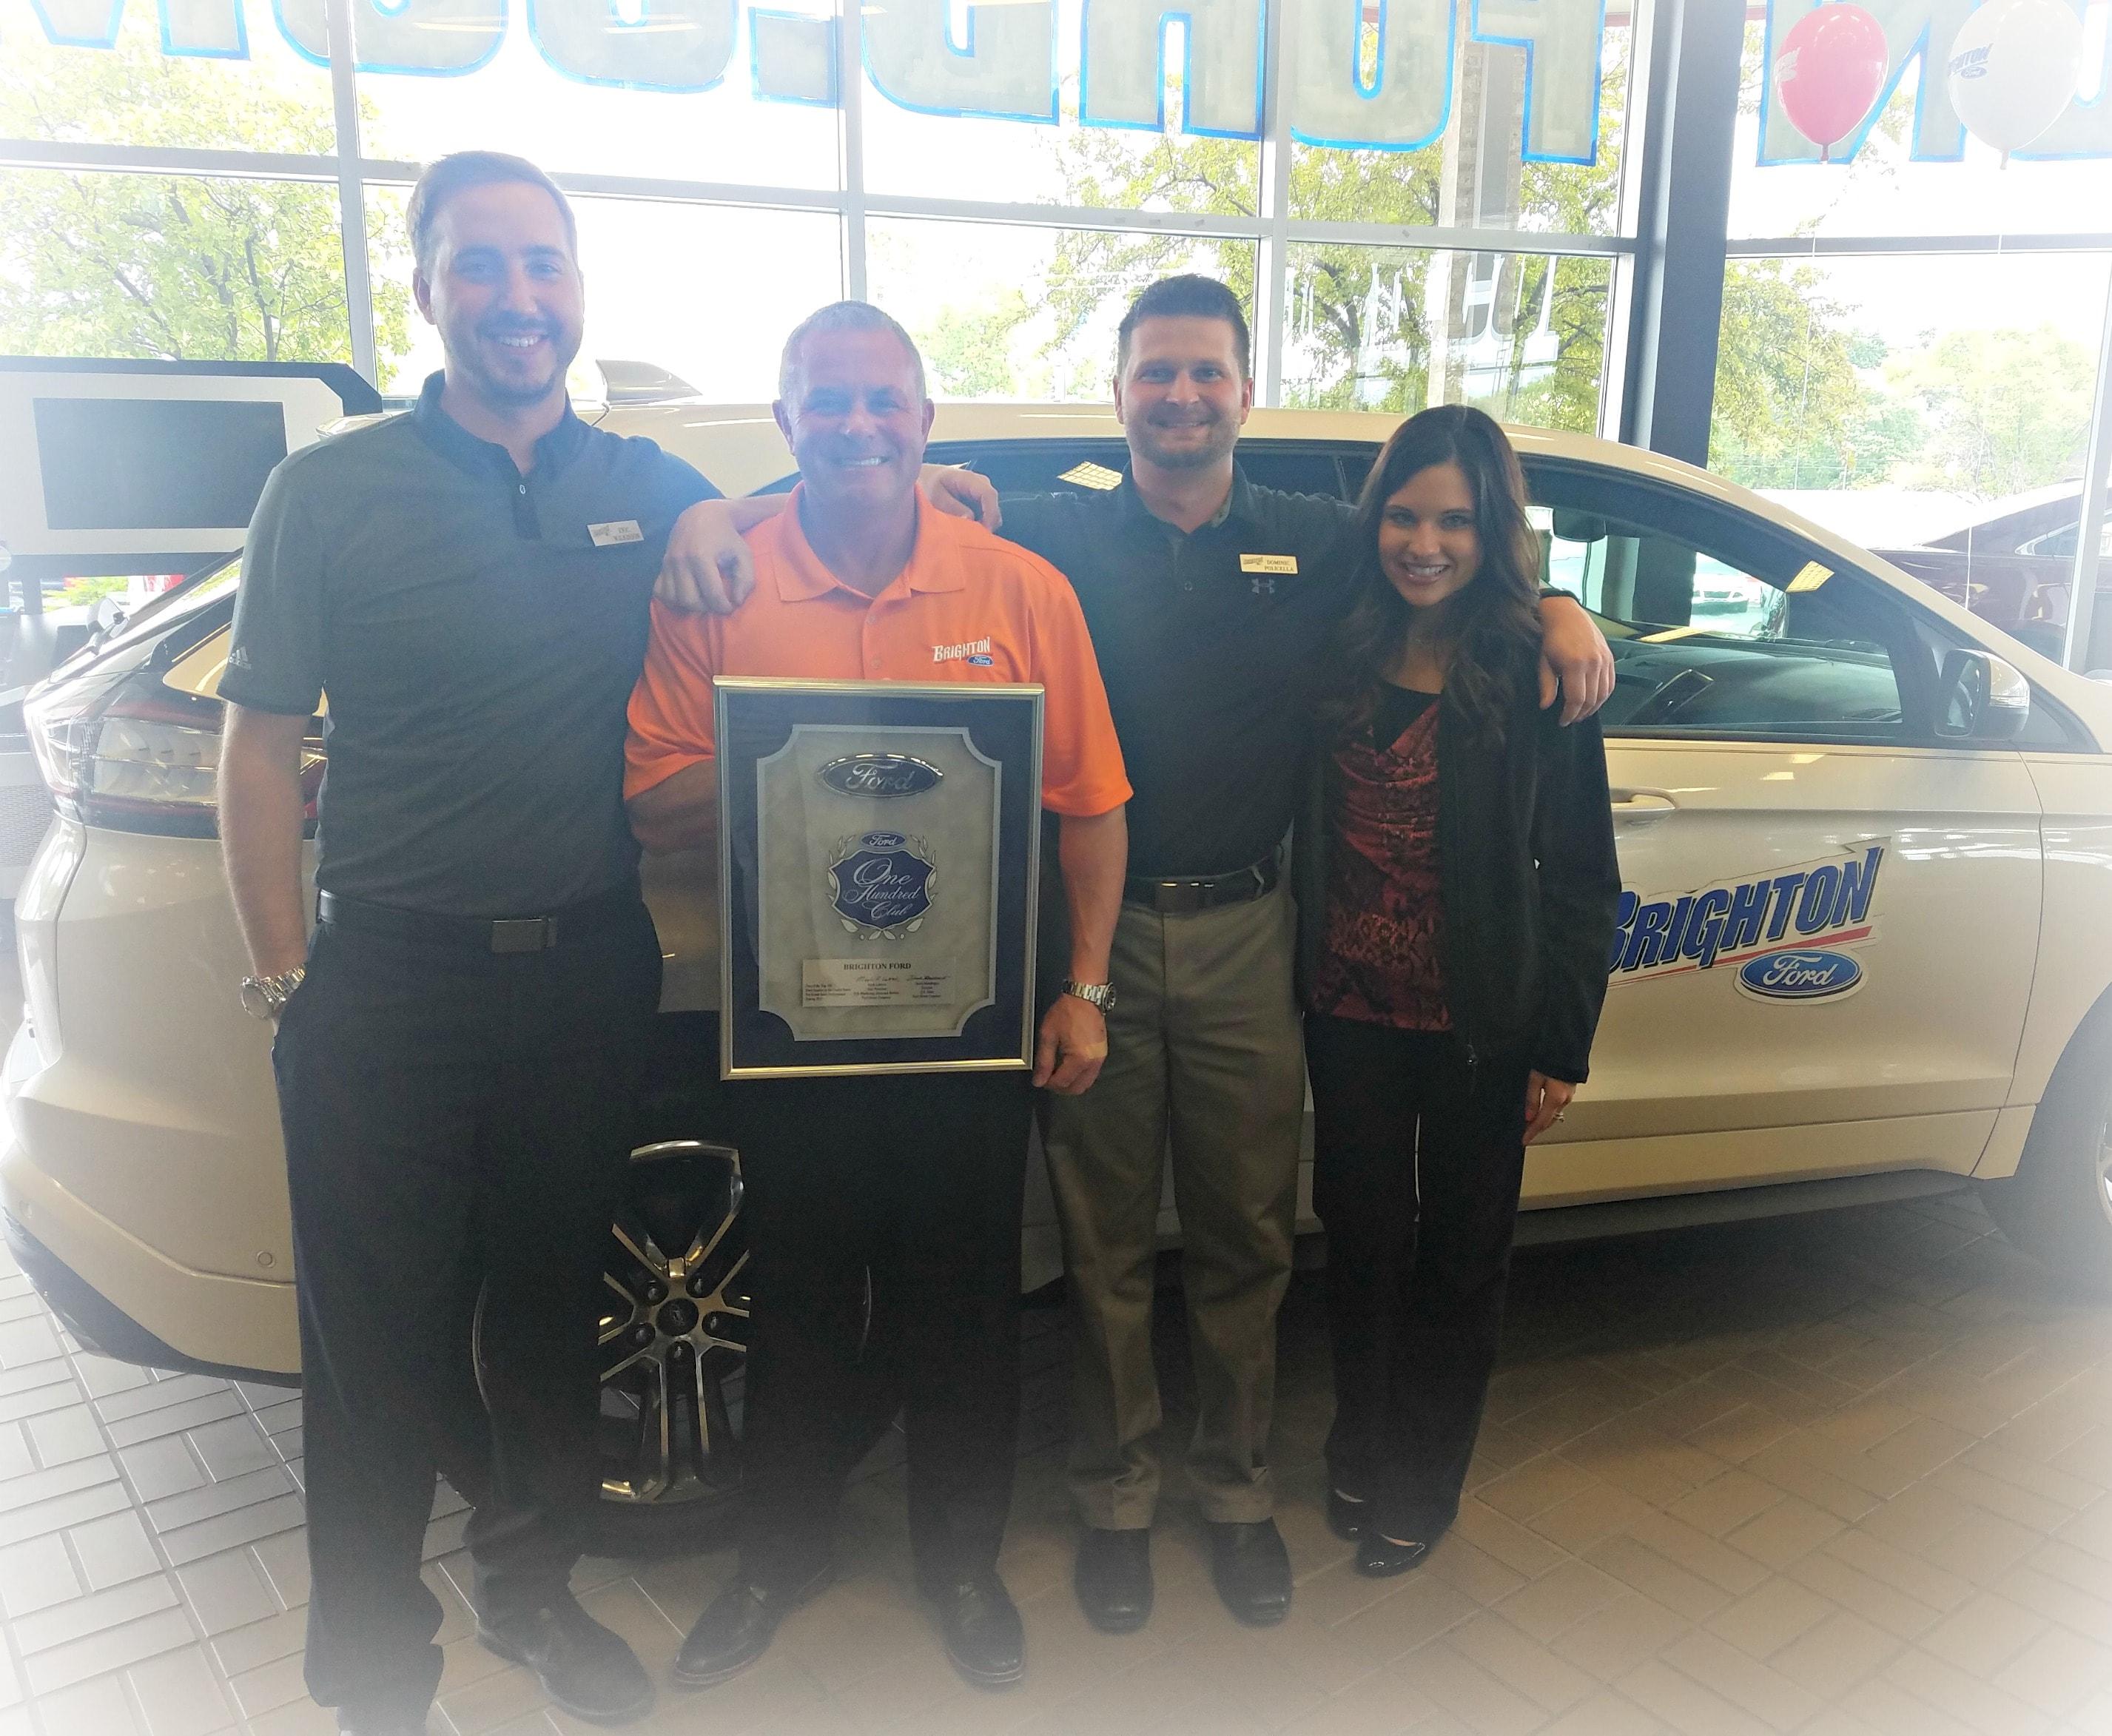 Brighton Ford | Brighton Ford Wins Top 100 Ford Dealer in America ...